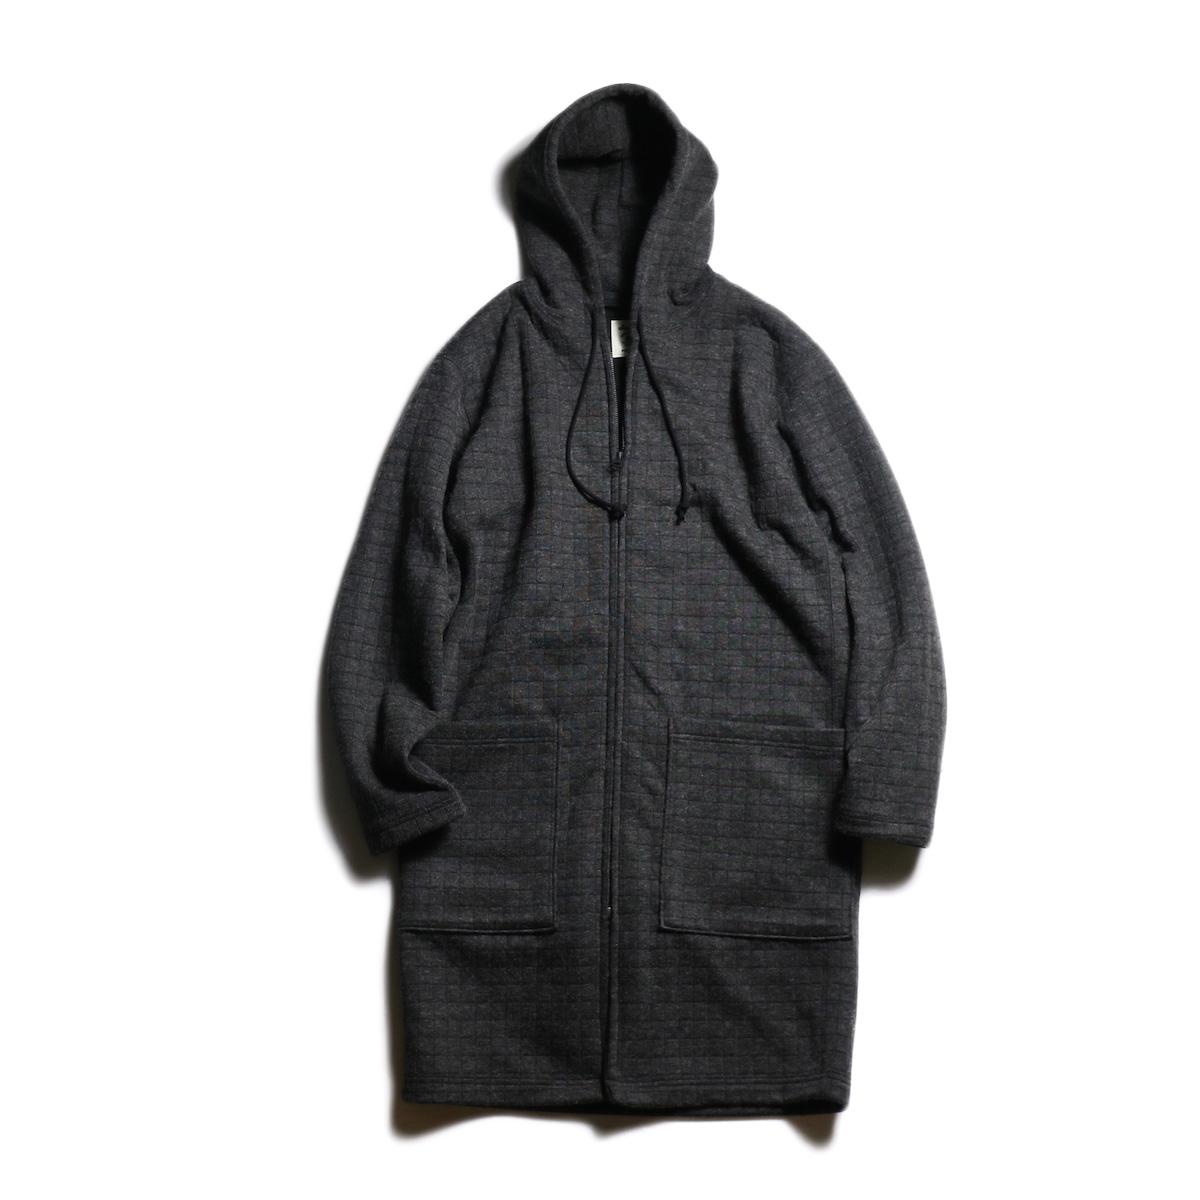 Jackman / Jersey Long Parka (Charcoal)